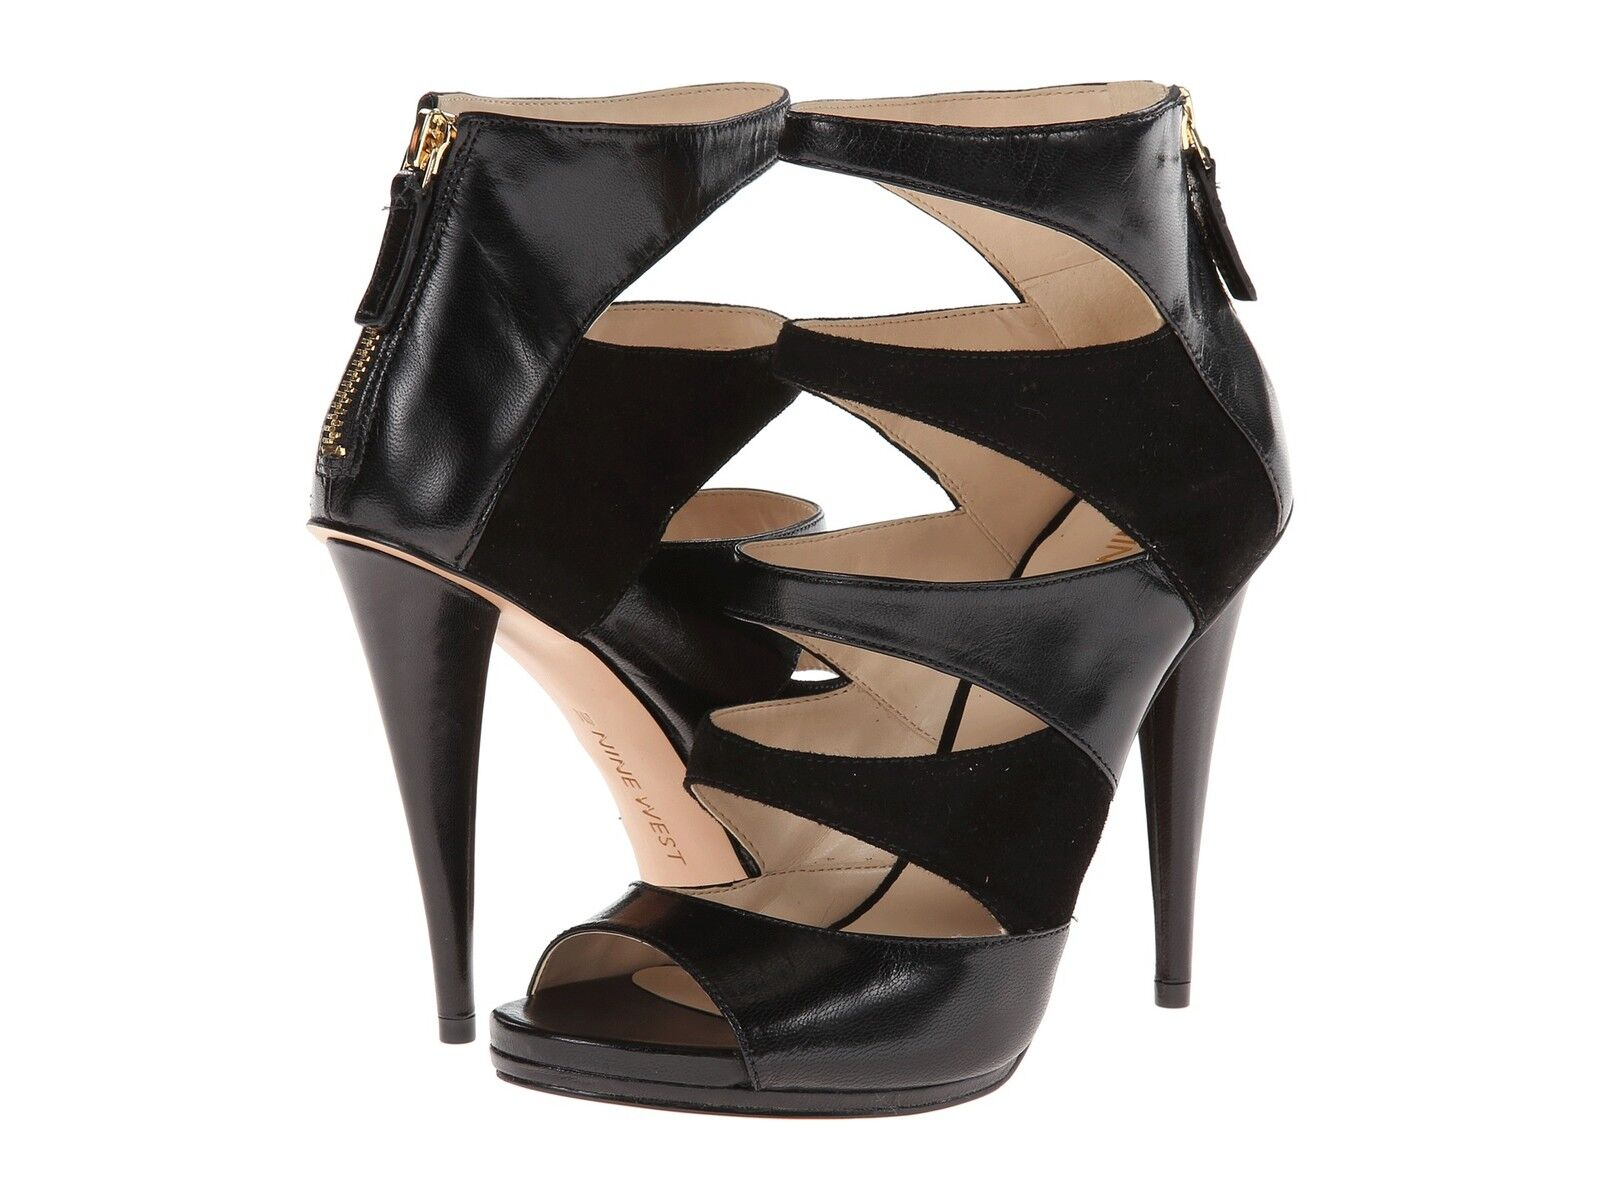 autentico New nine nine nine west sz 7.5 amability leather peeptoe sandal shootie avvioie pump heel  ampia selezione